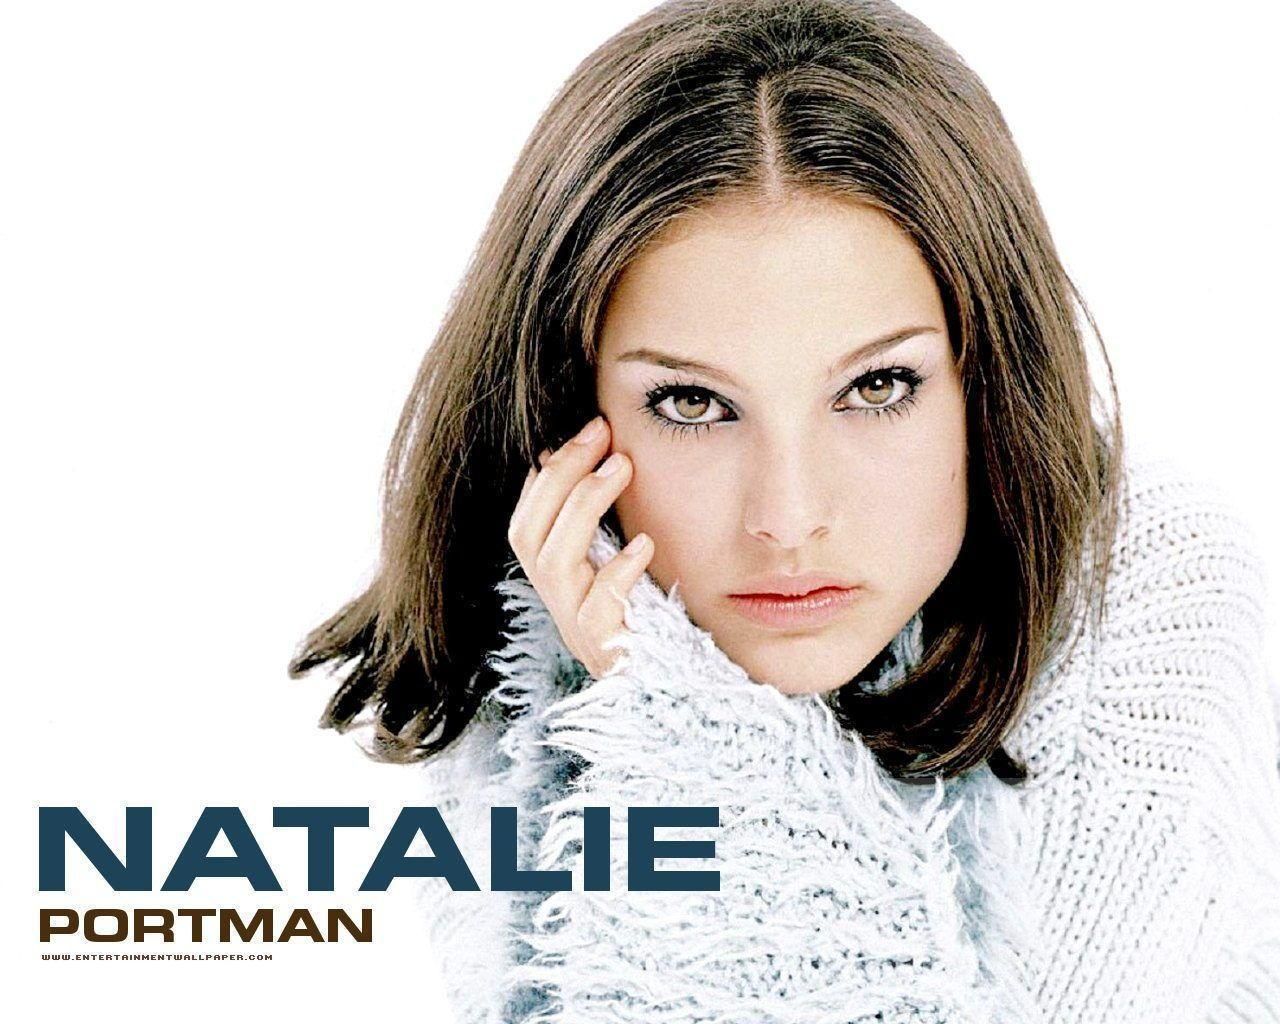 Natalie Portman Wallpapers - HD Wallpapers Inn